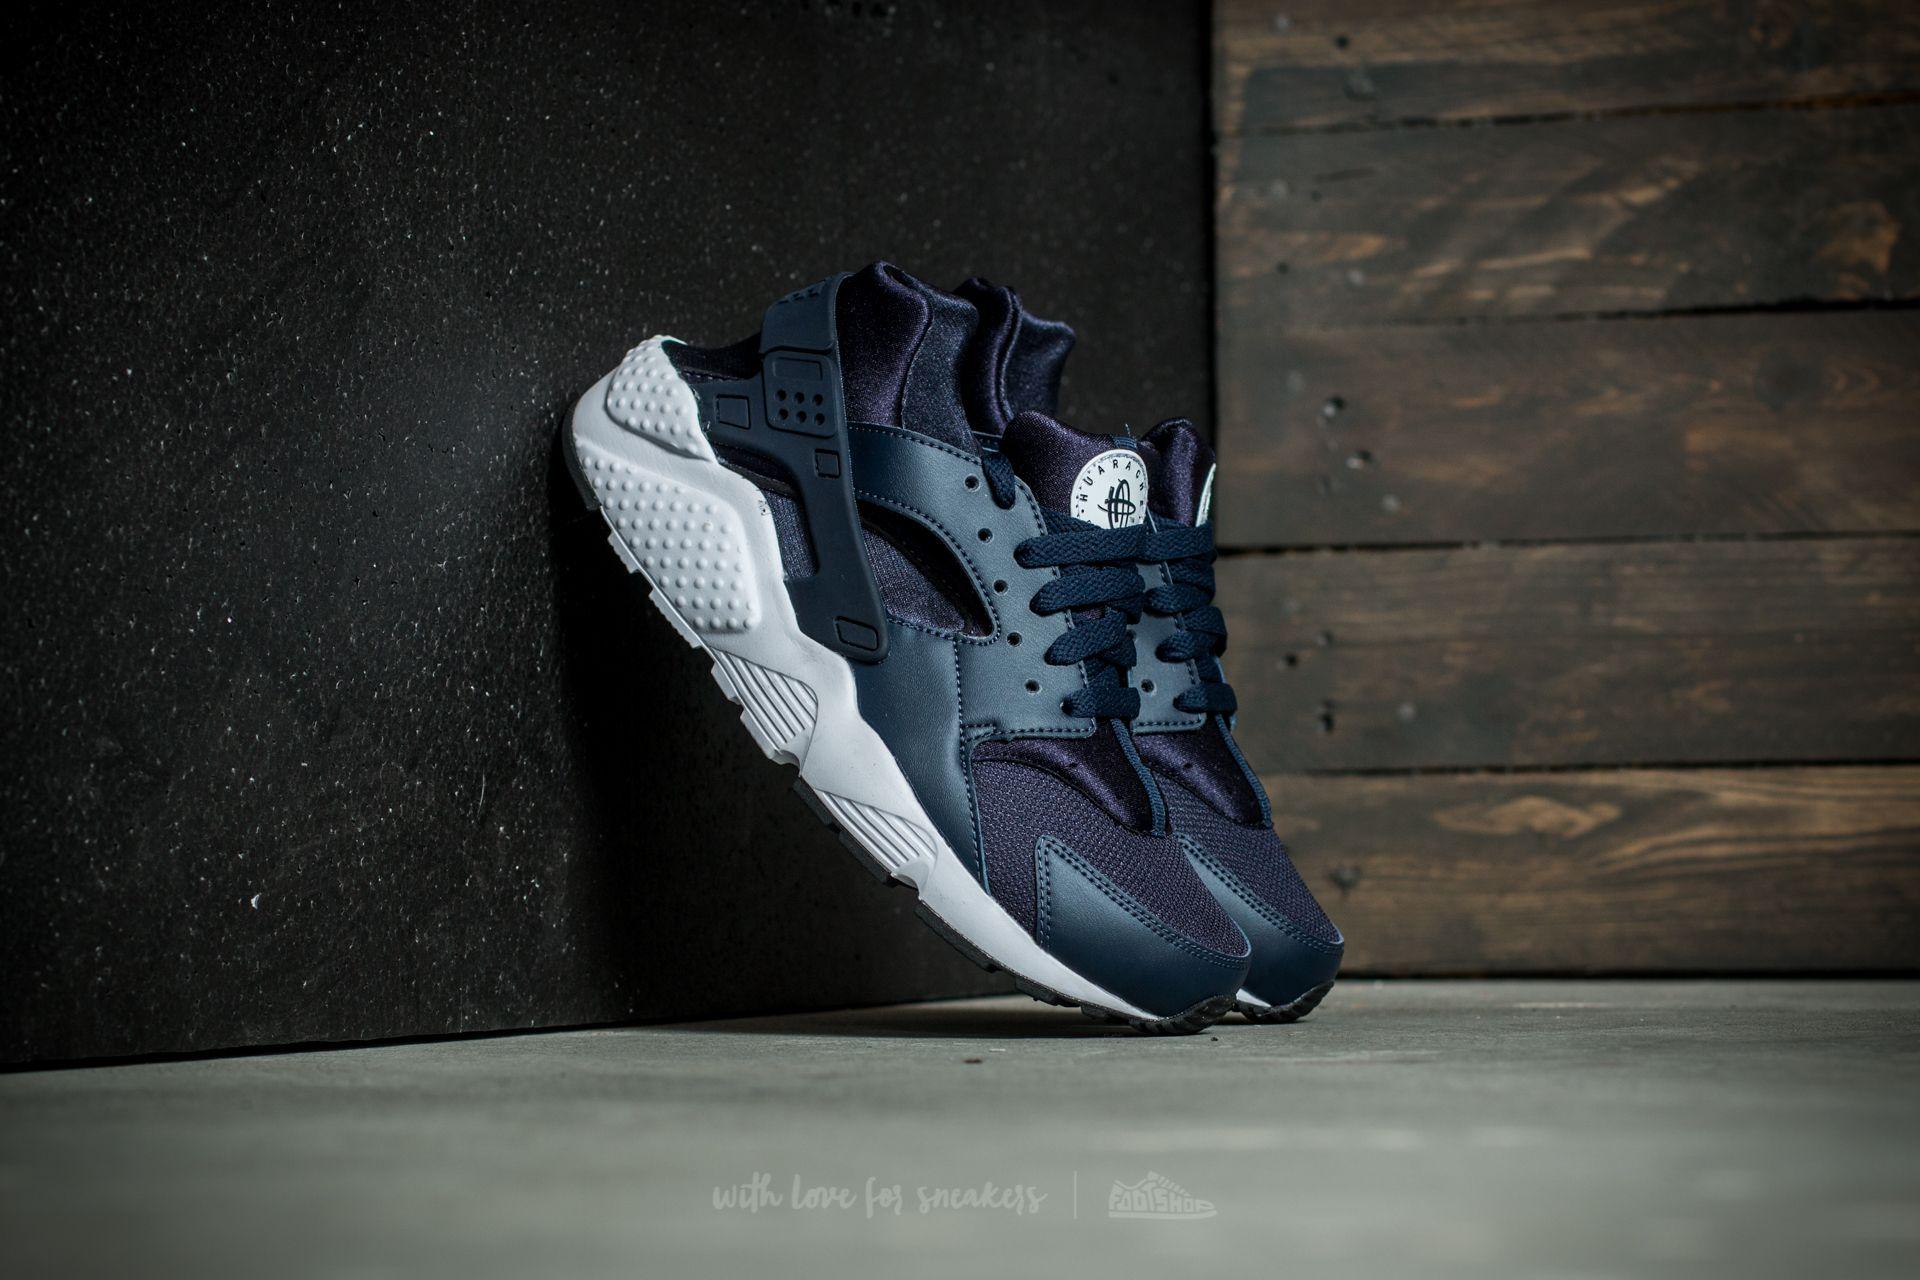 556dddd3c76e Nike Huarache Run (GS) Obsidian  Obsidian-Black-White